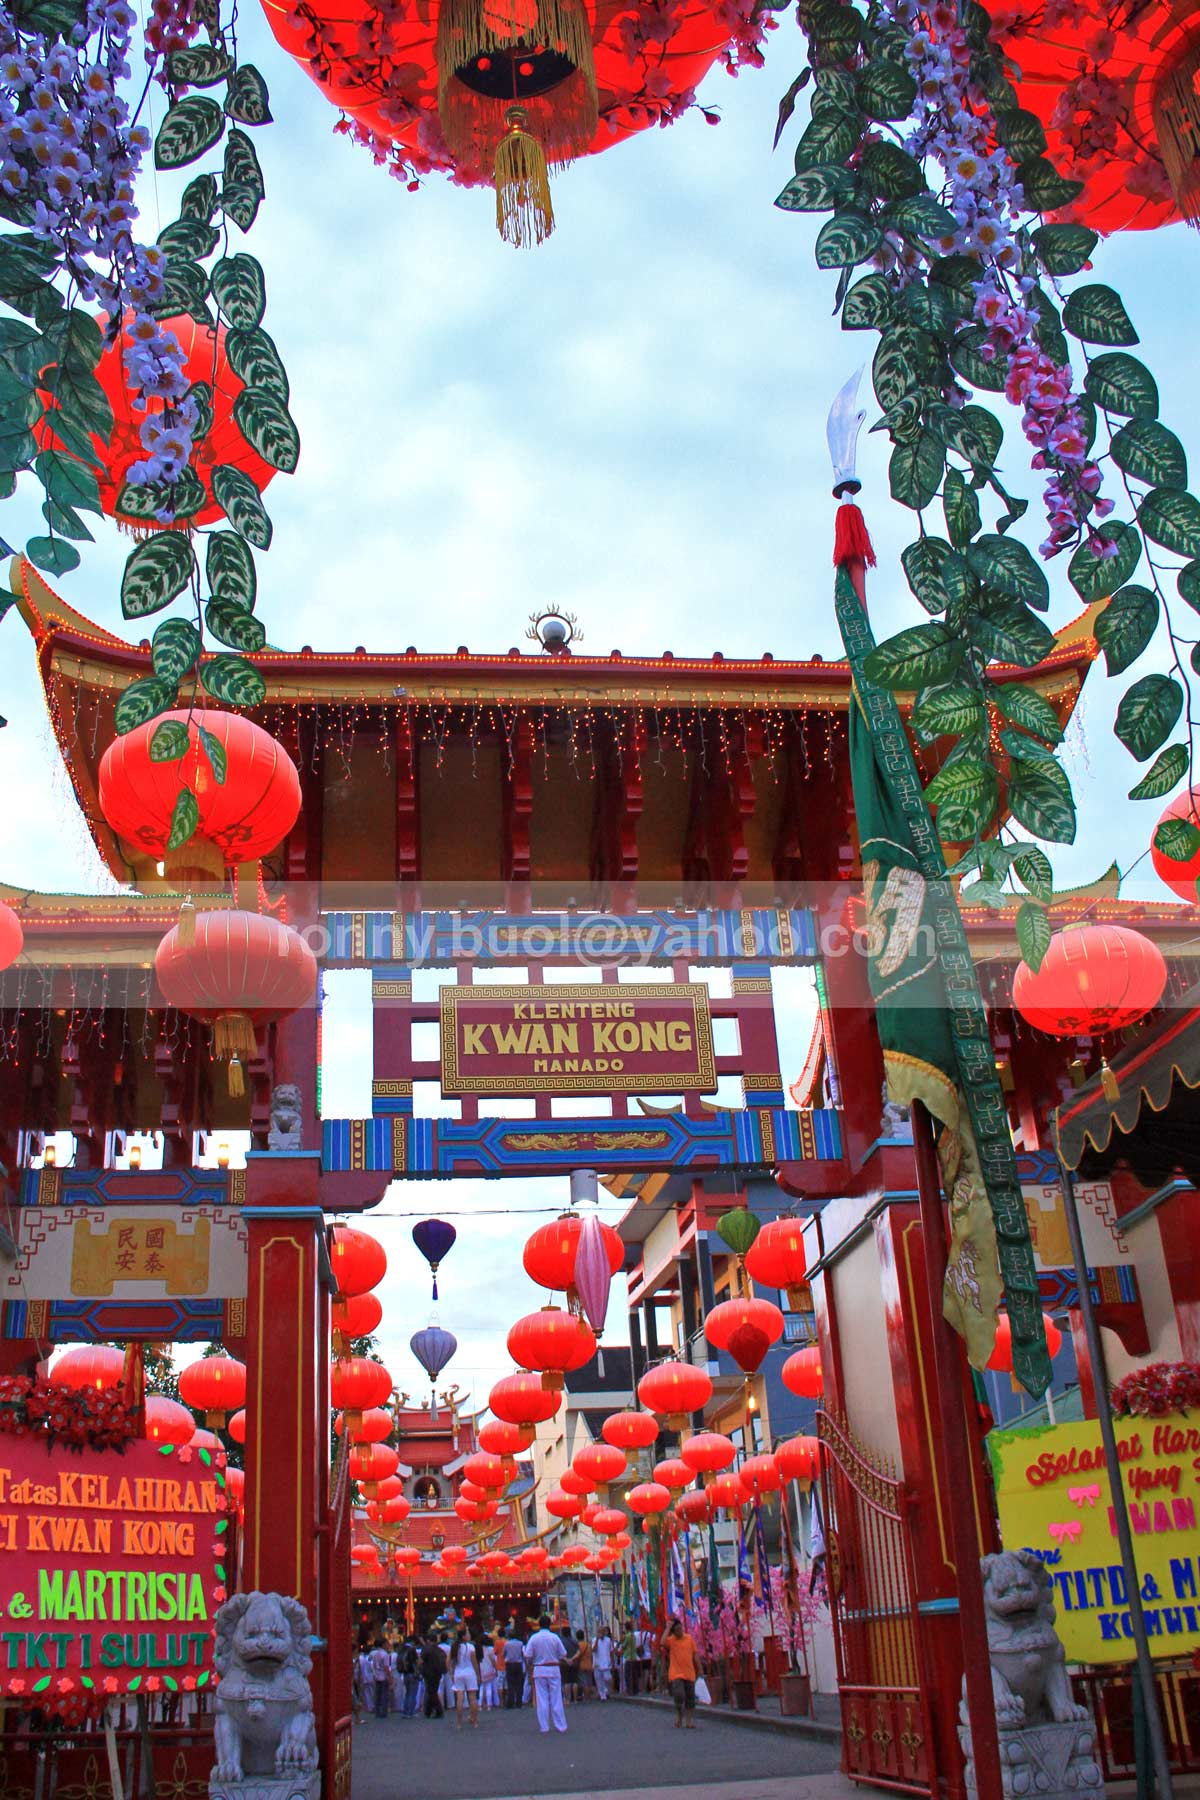 KWANG KONG DAN LAMPION -- Pintu gerbang Klenteng Kwang Kong terlihat indah dengan hiasan lampion sewaktu perayaan HUT Dewa Kwang Kong. Klenteng Kwang Kong merupakan salah satu klenteng utama di Kota Manado. 7D | 18-135mm | FL18mm | F/9 | 1/100s | ISO1000 | No Tripod | Taken date: 31 Juli 2013.